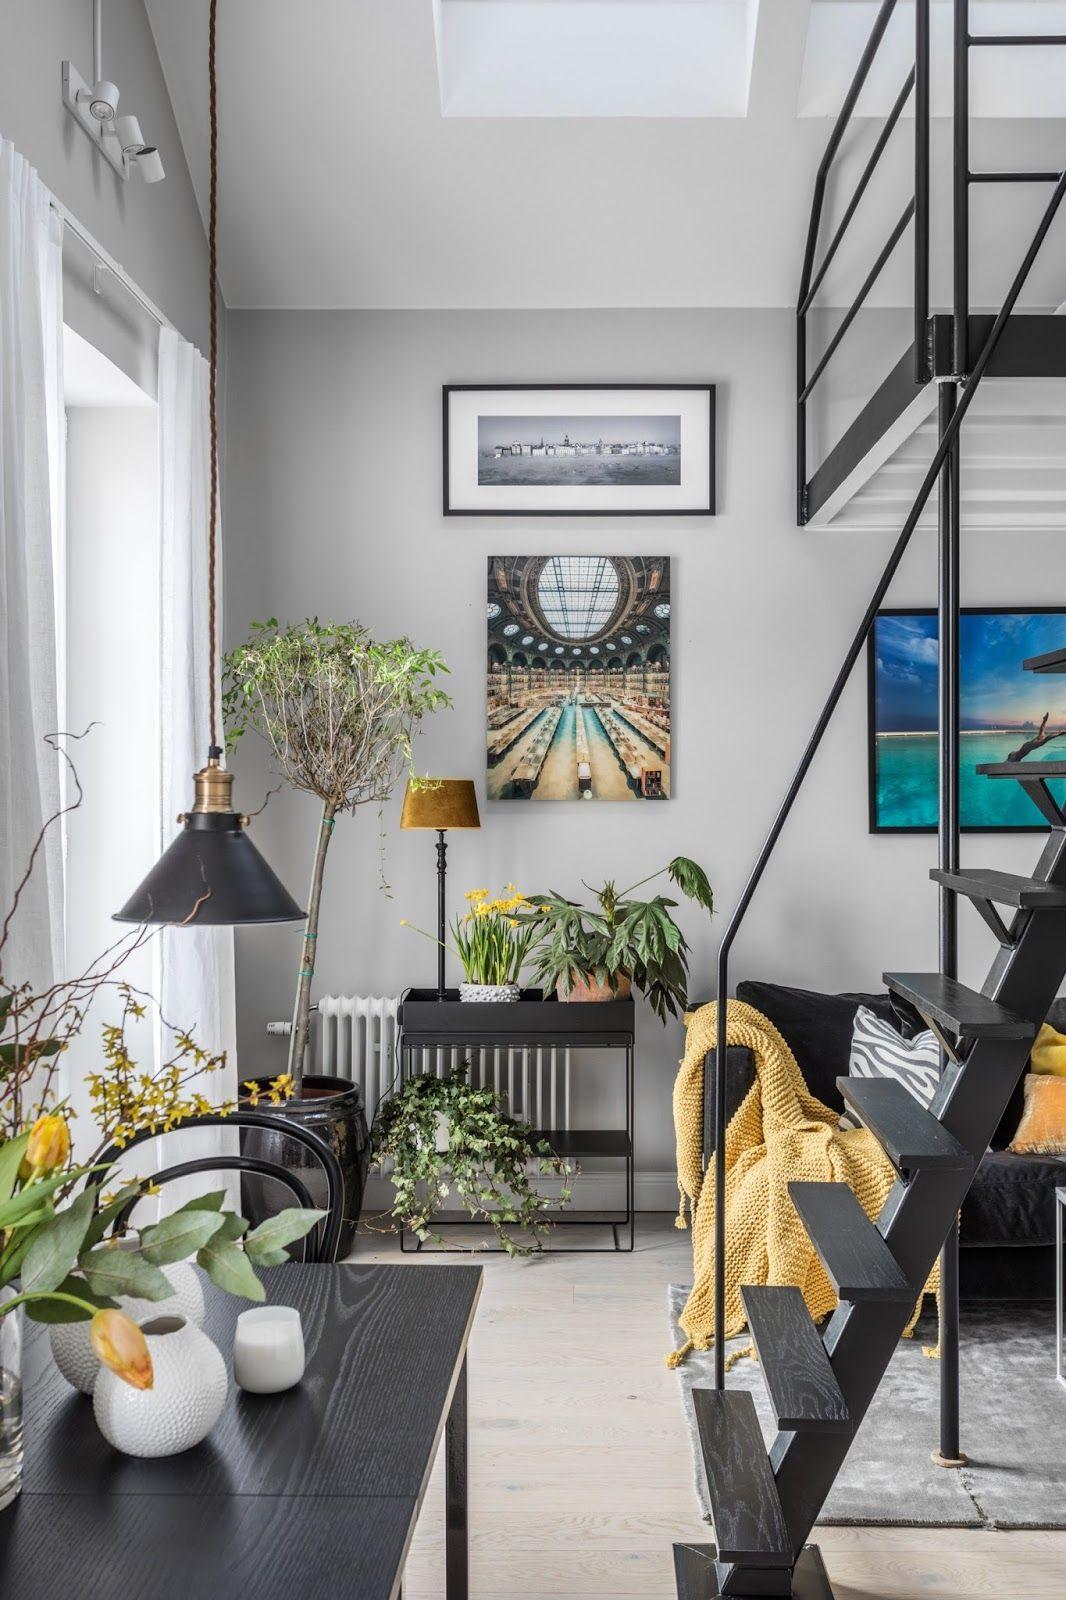 Dormitor deasupra livingului intr  garsonier de numai  jurnal design interior also rh pinterest